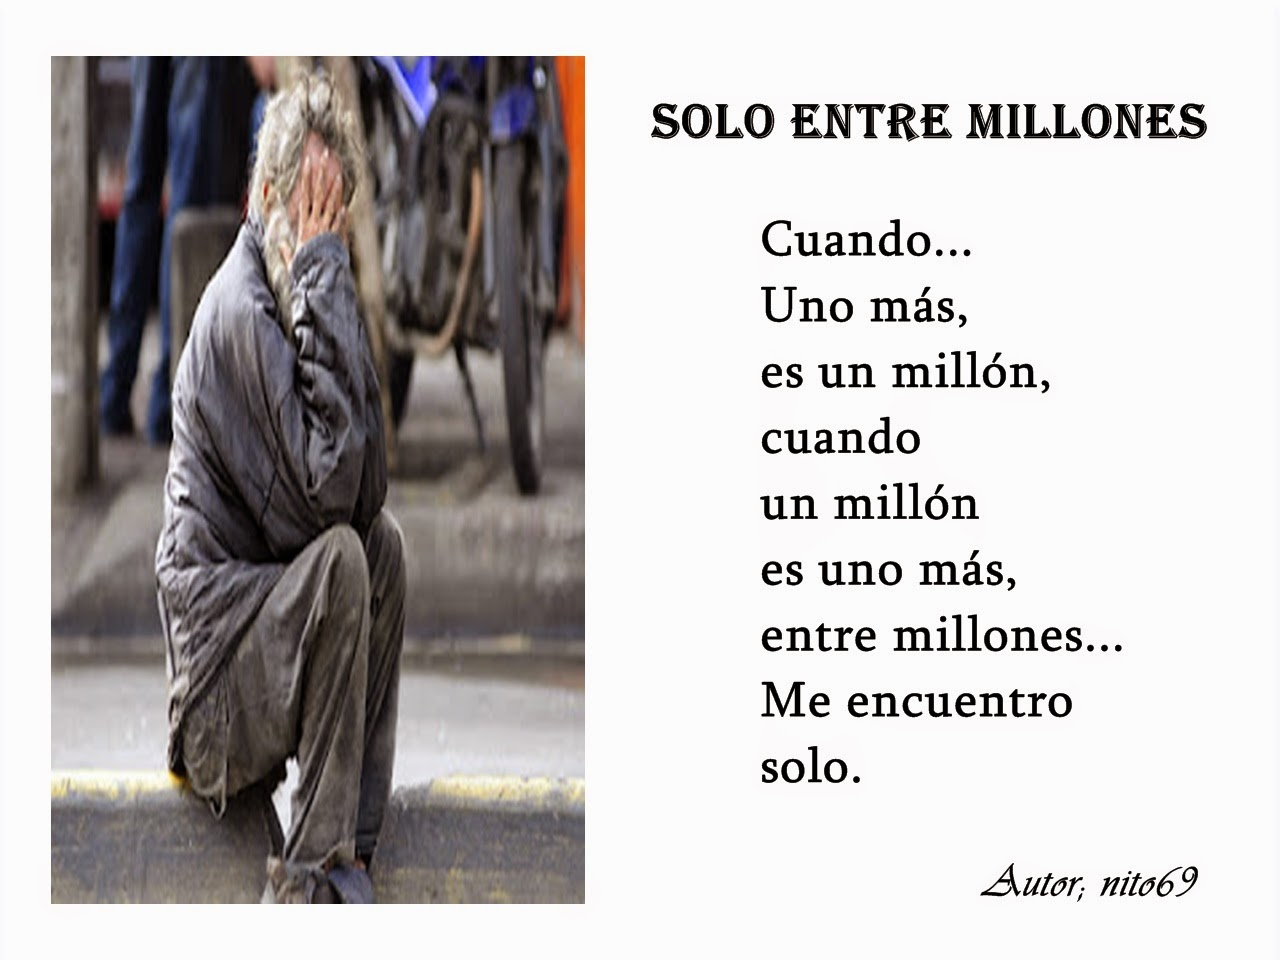 SOLO ENTRE MILLONES